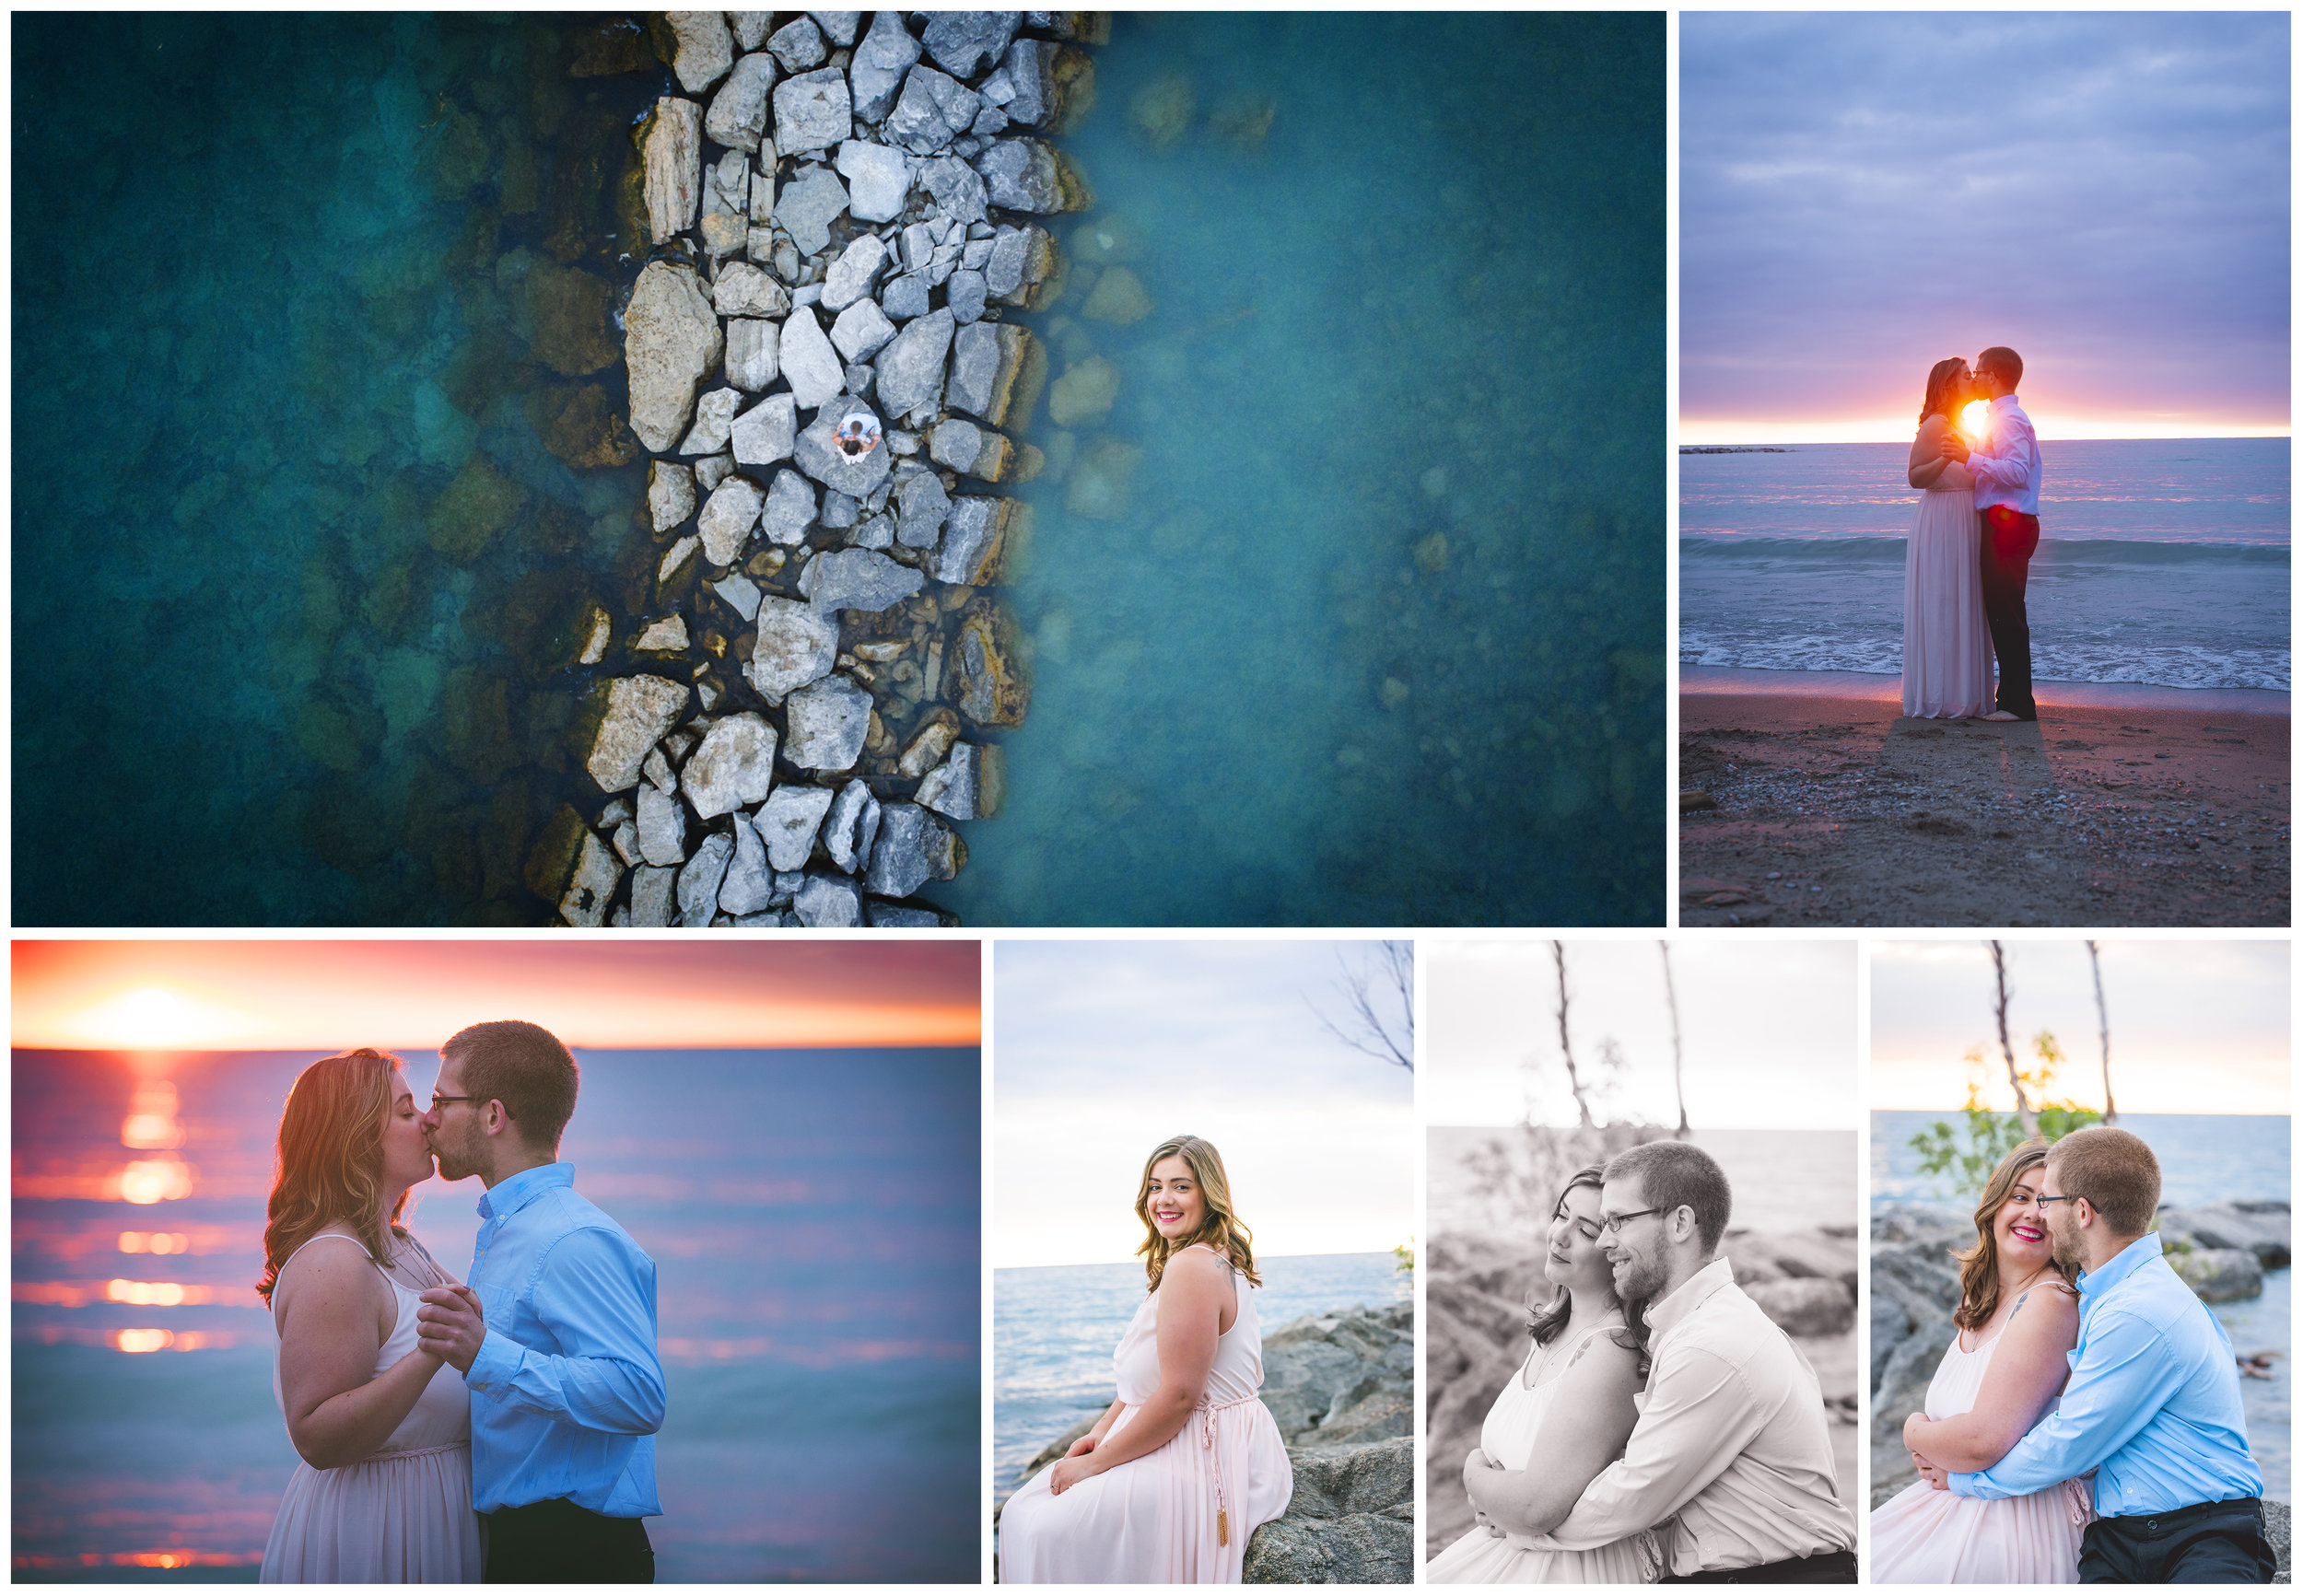 Engagementphoto4.jpg